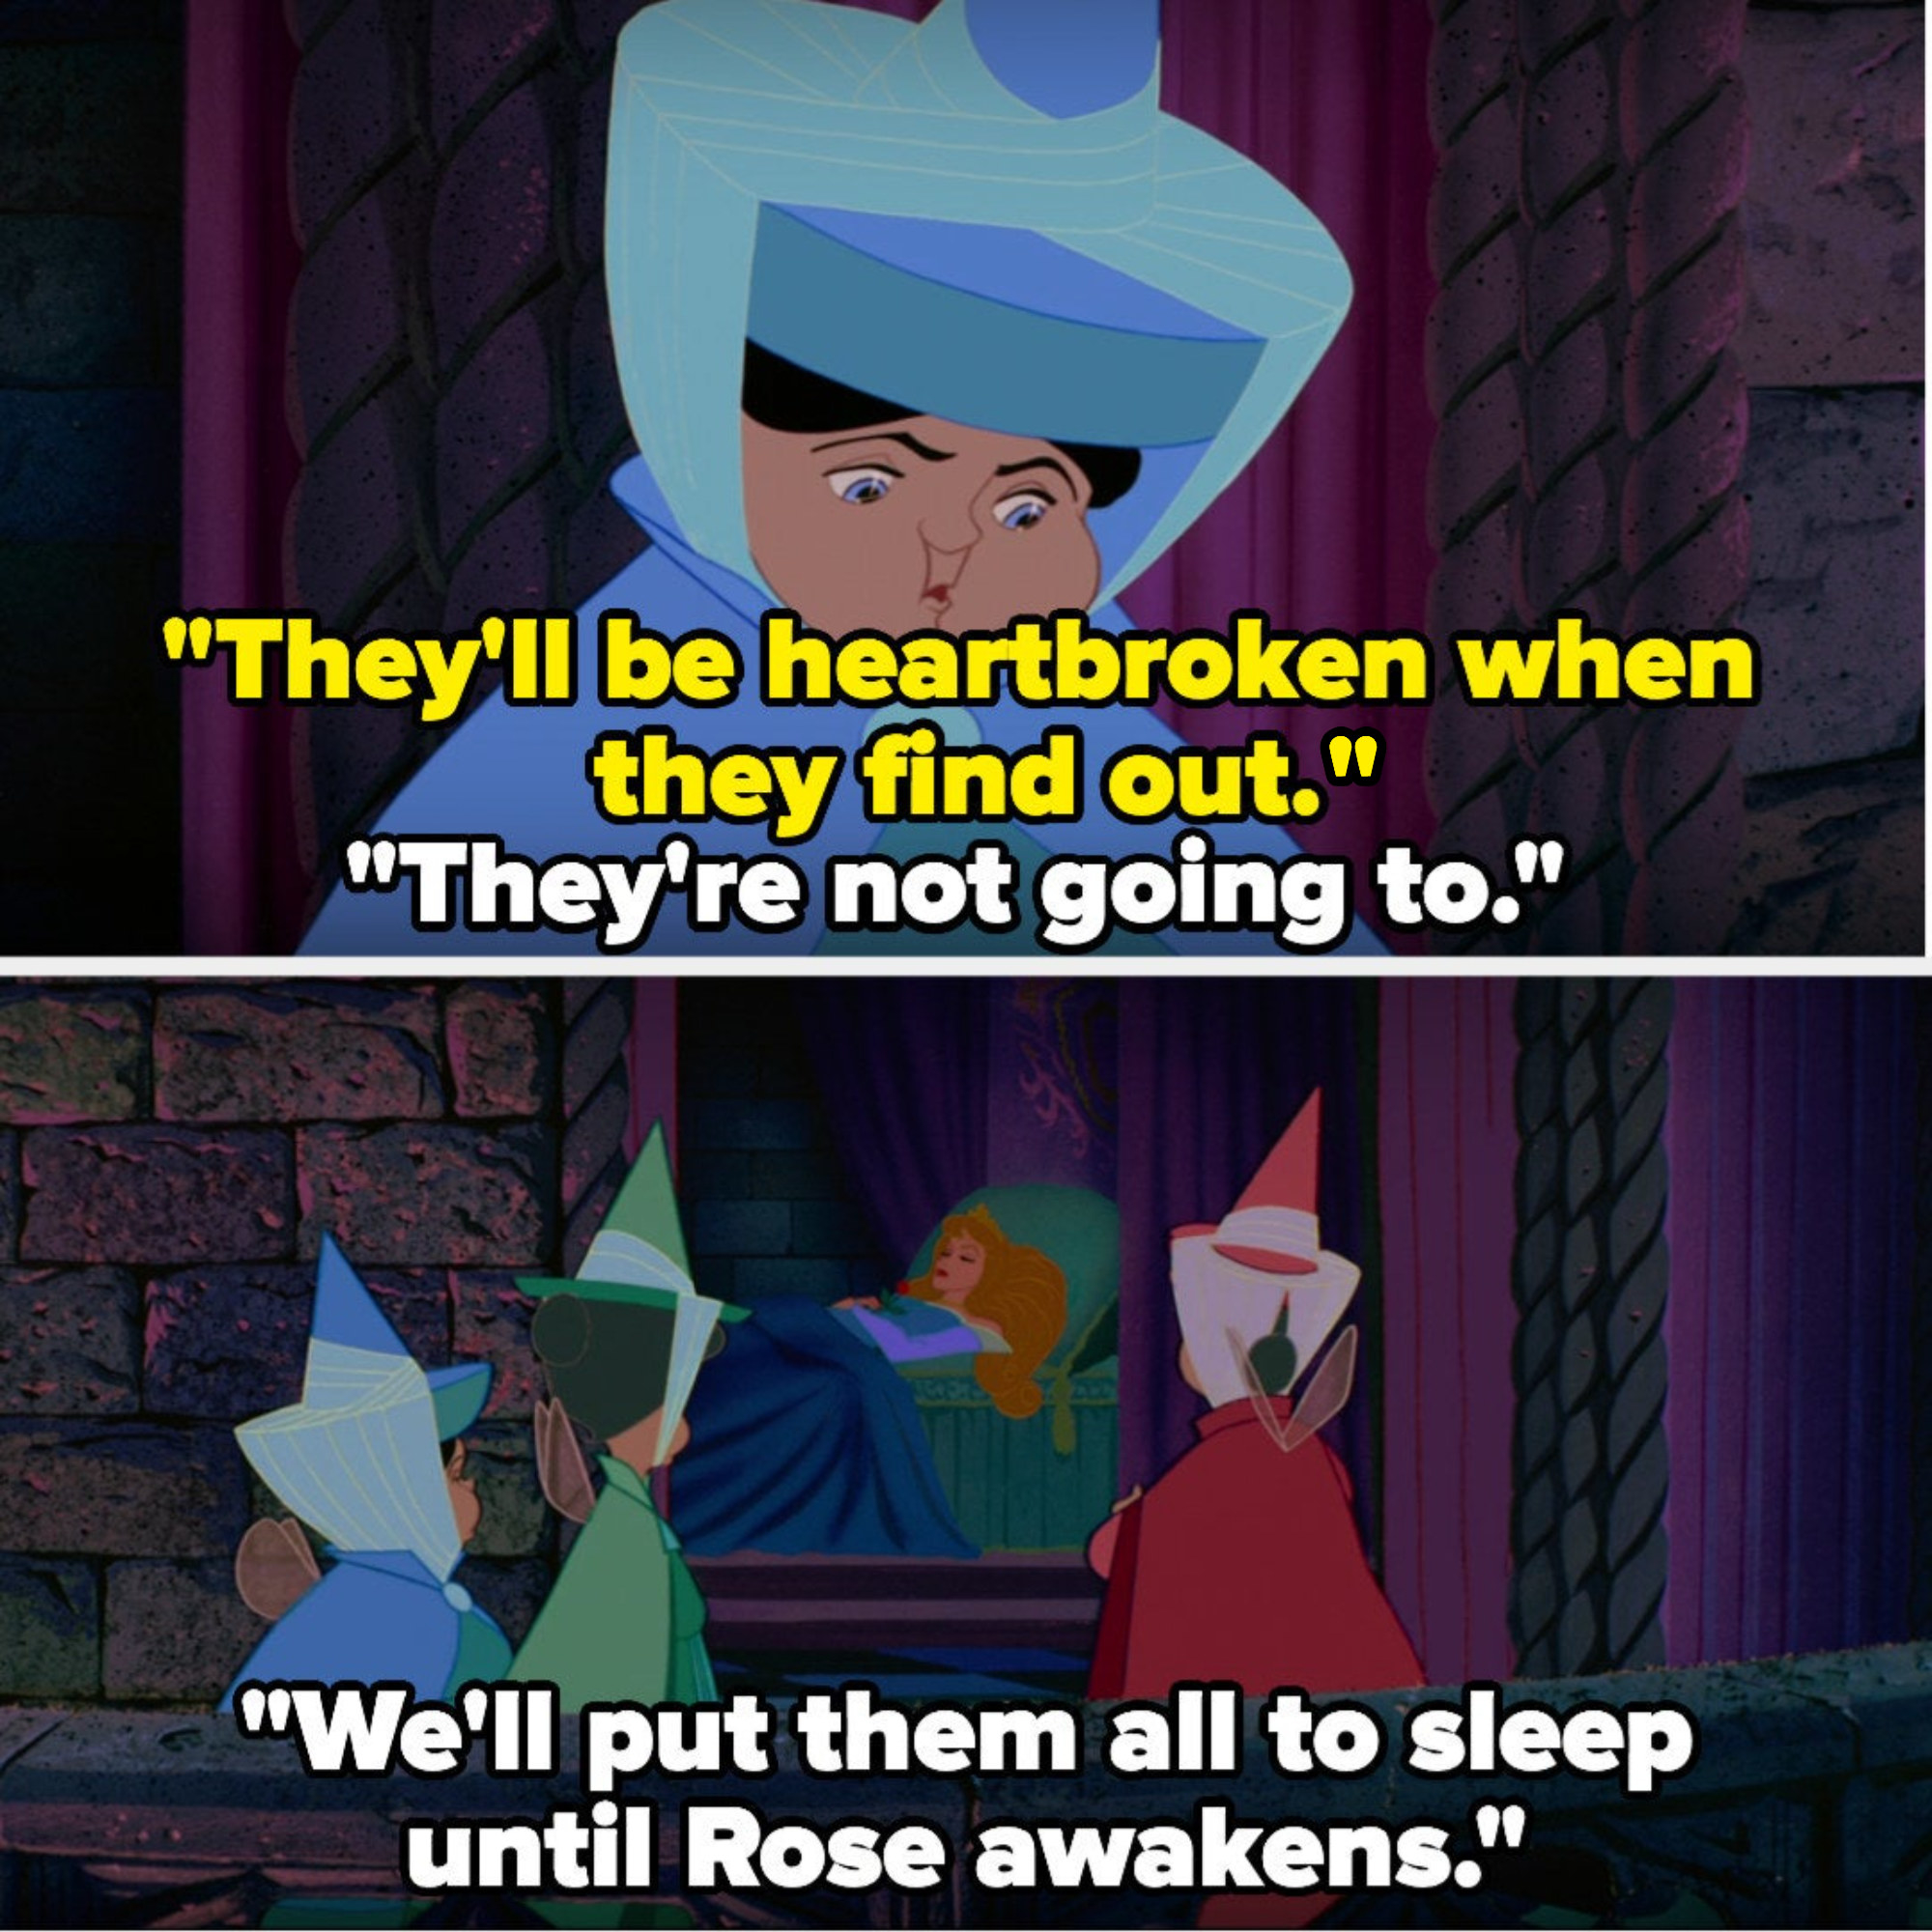 The fairies decide to put everyone to sleep until Aurora awakens